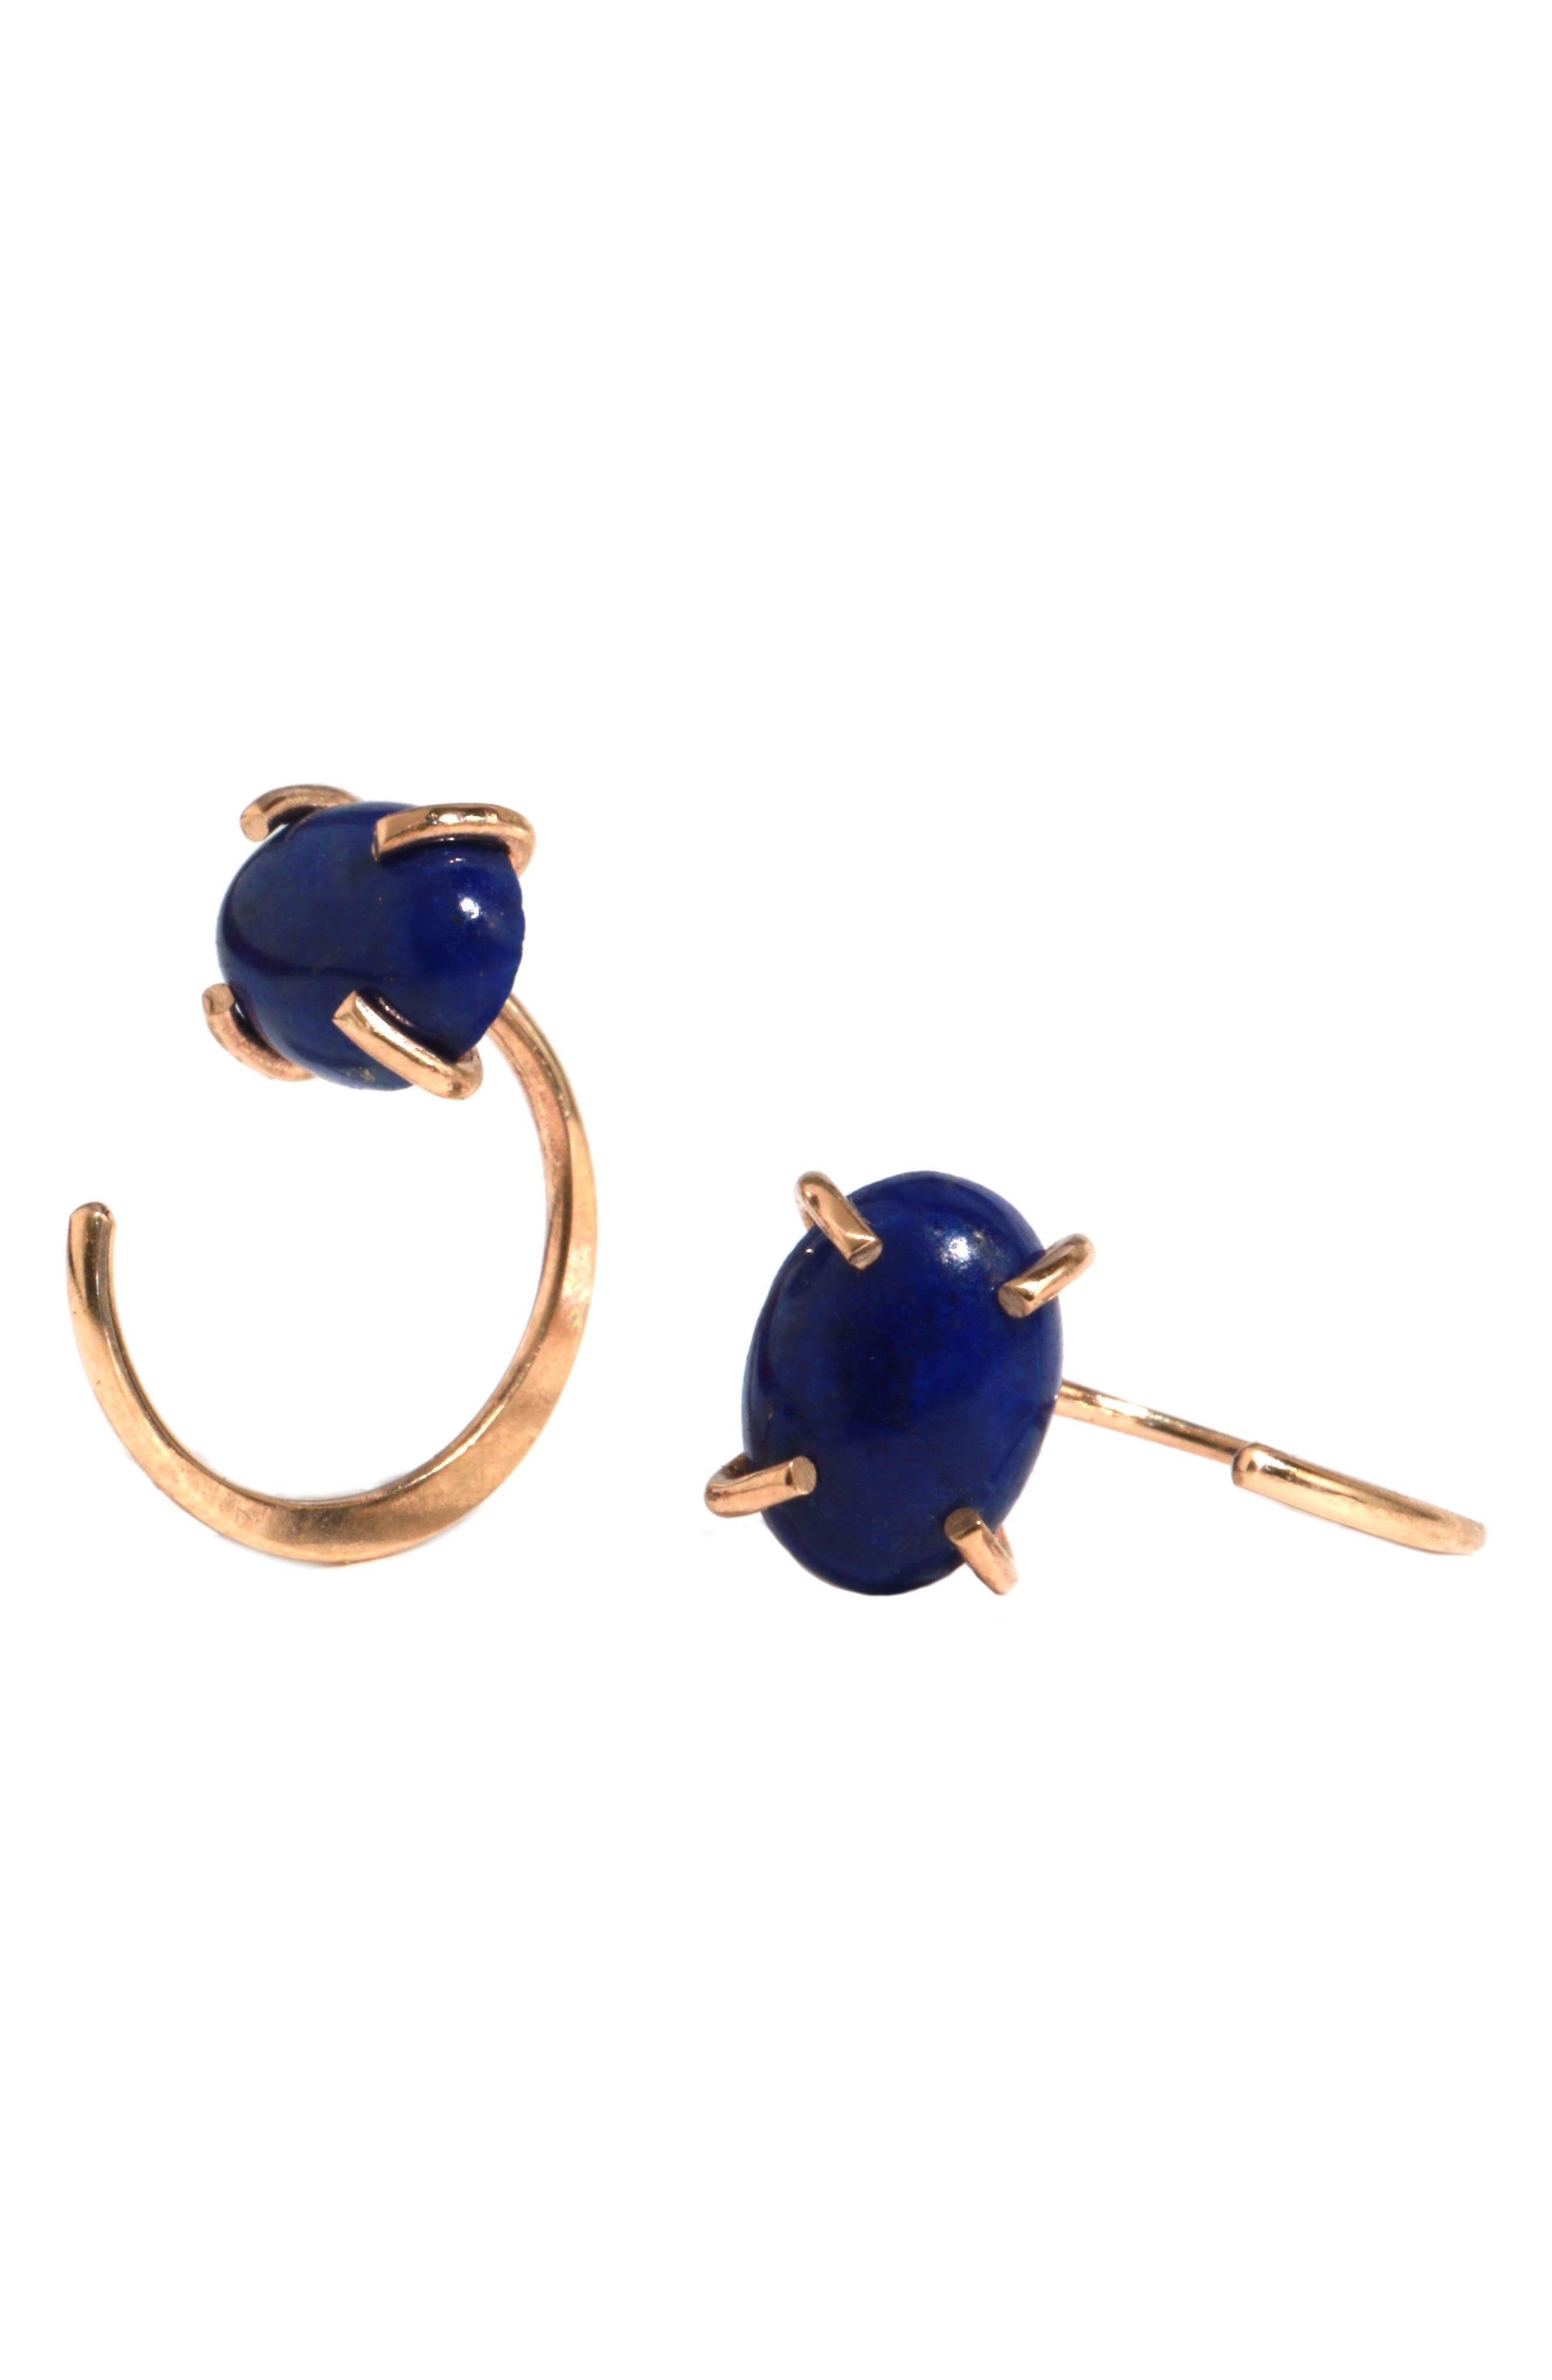 Main Image - Melissa Joy Manning Lapis Lazuli Earrings